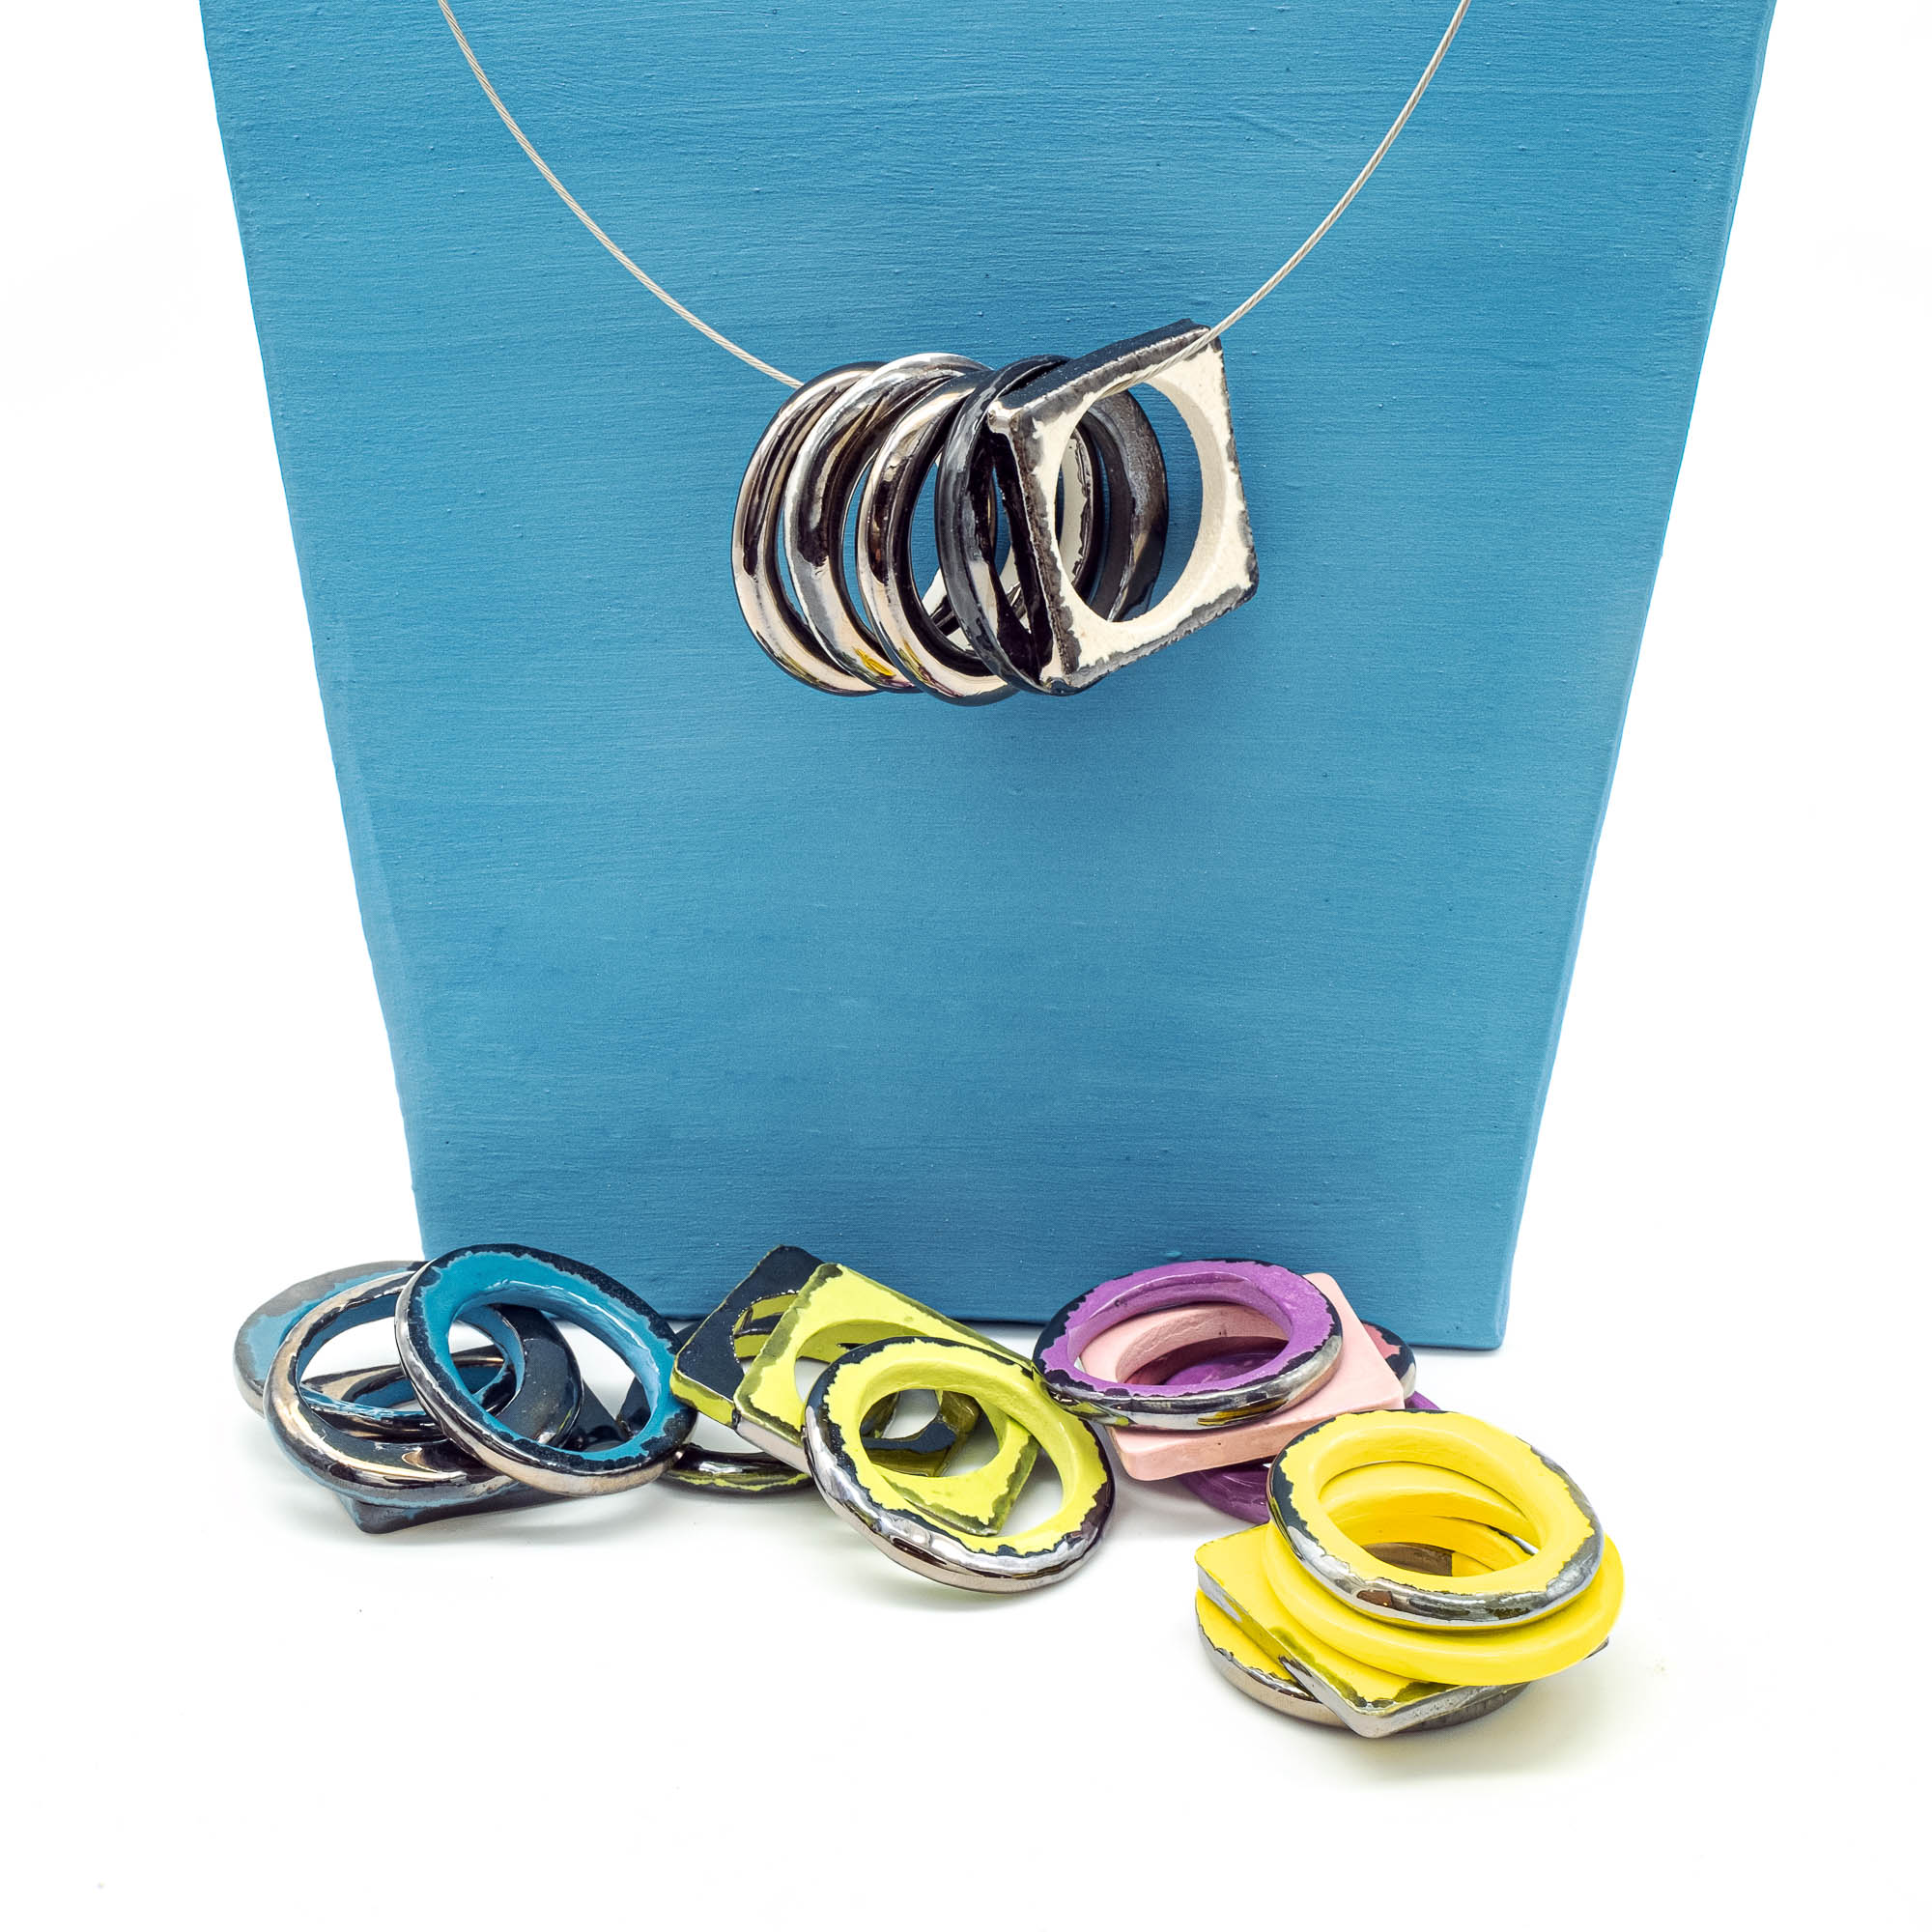 Collane in ceramica - Stefania Mairano Creazioni in Ceramica